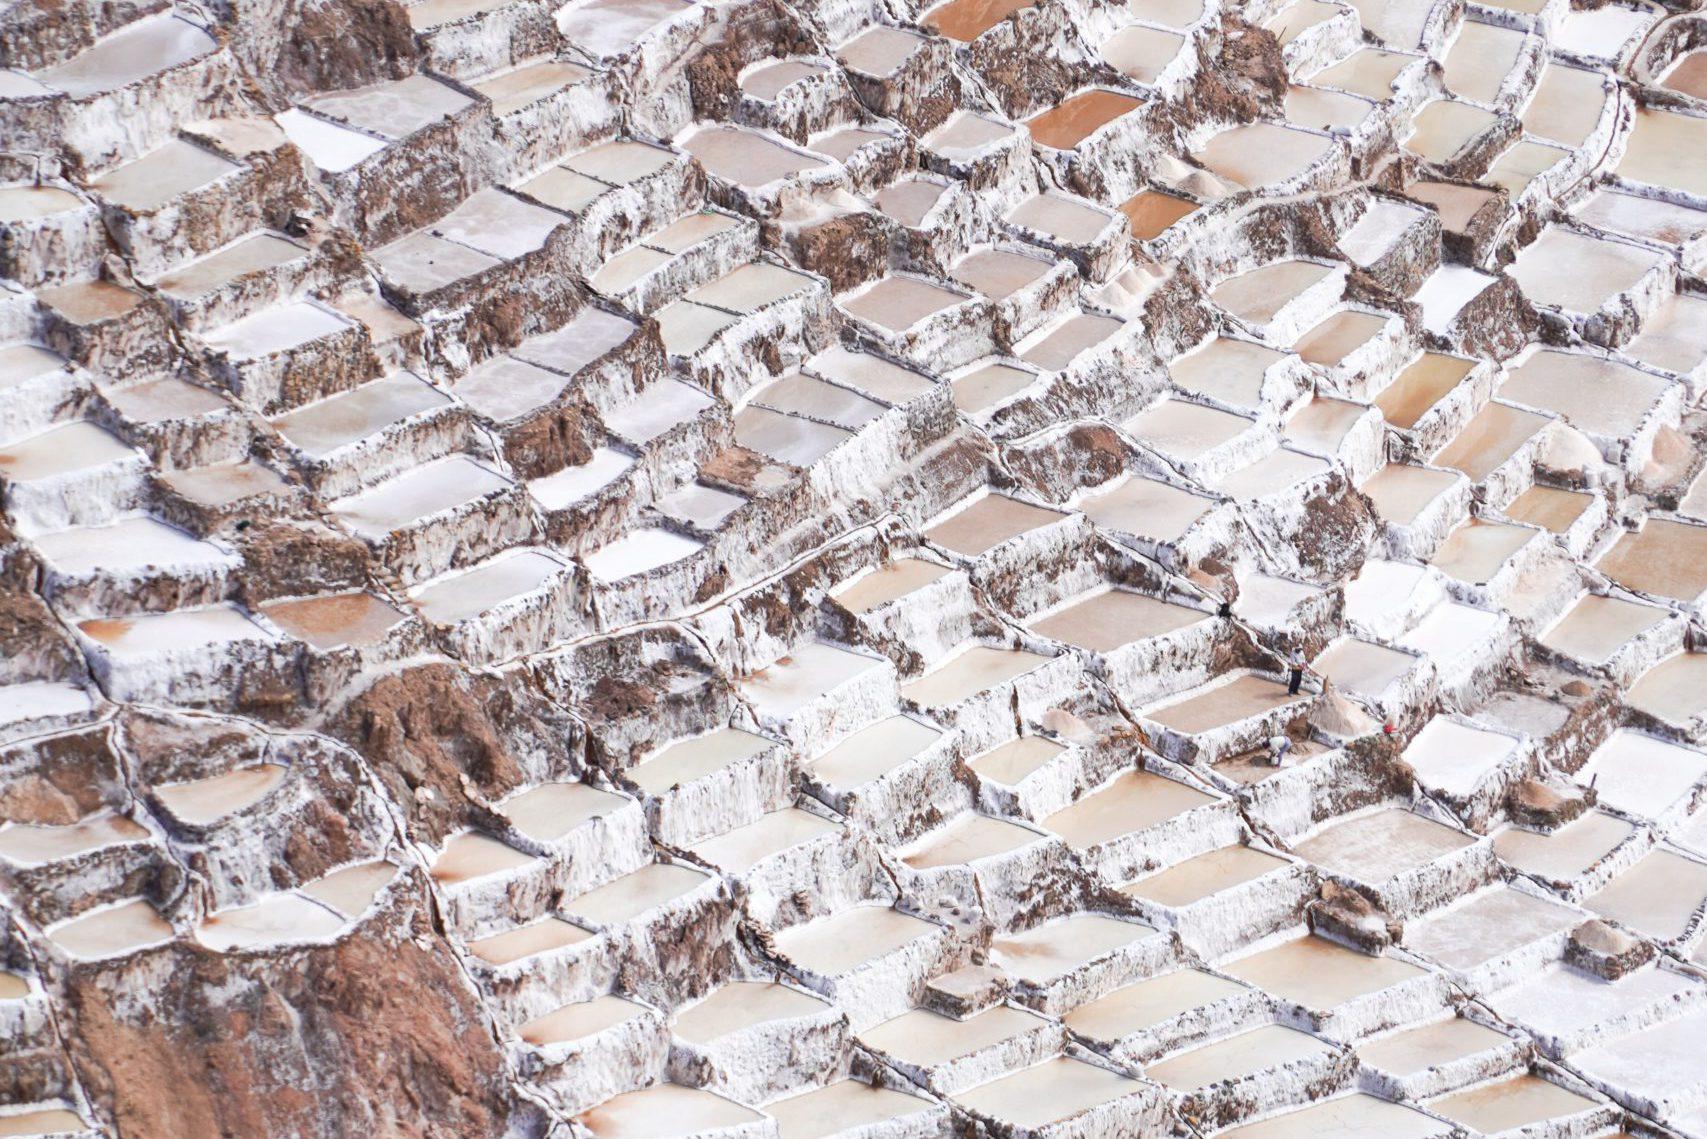 Sacred Valley at Maras Salt Mines 02 - Peru Quechuas Lodge Ollantaytambo